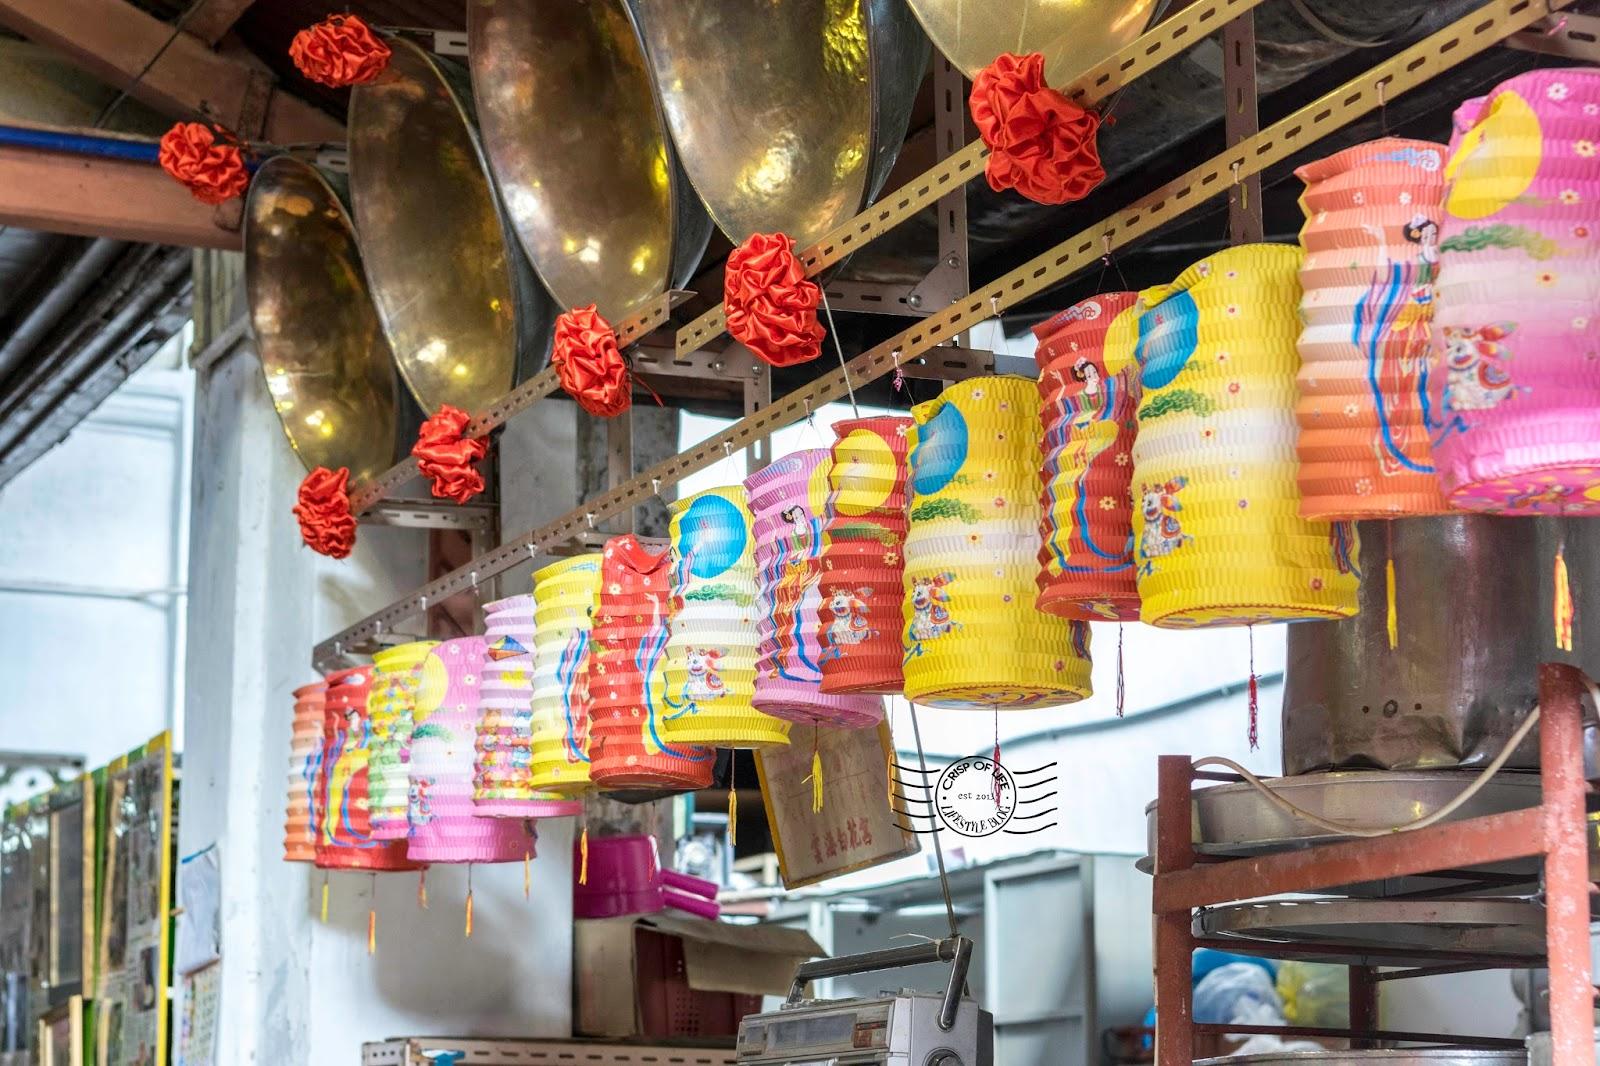 Moh Teng Pheow Nyonya Kuih 莫定標娘惹粿廠 Chulia Street